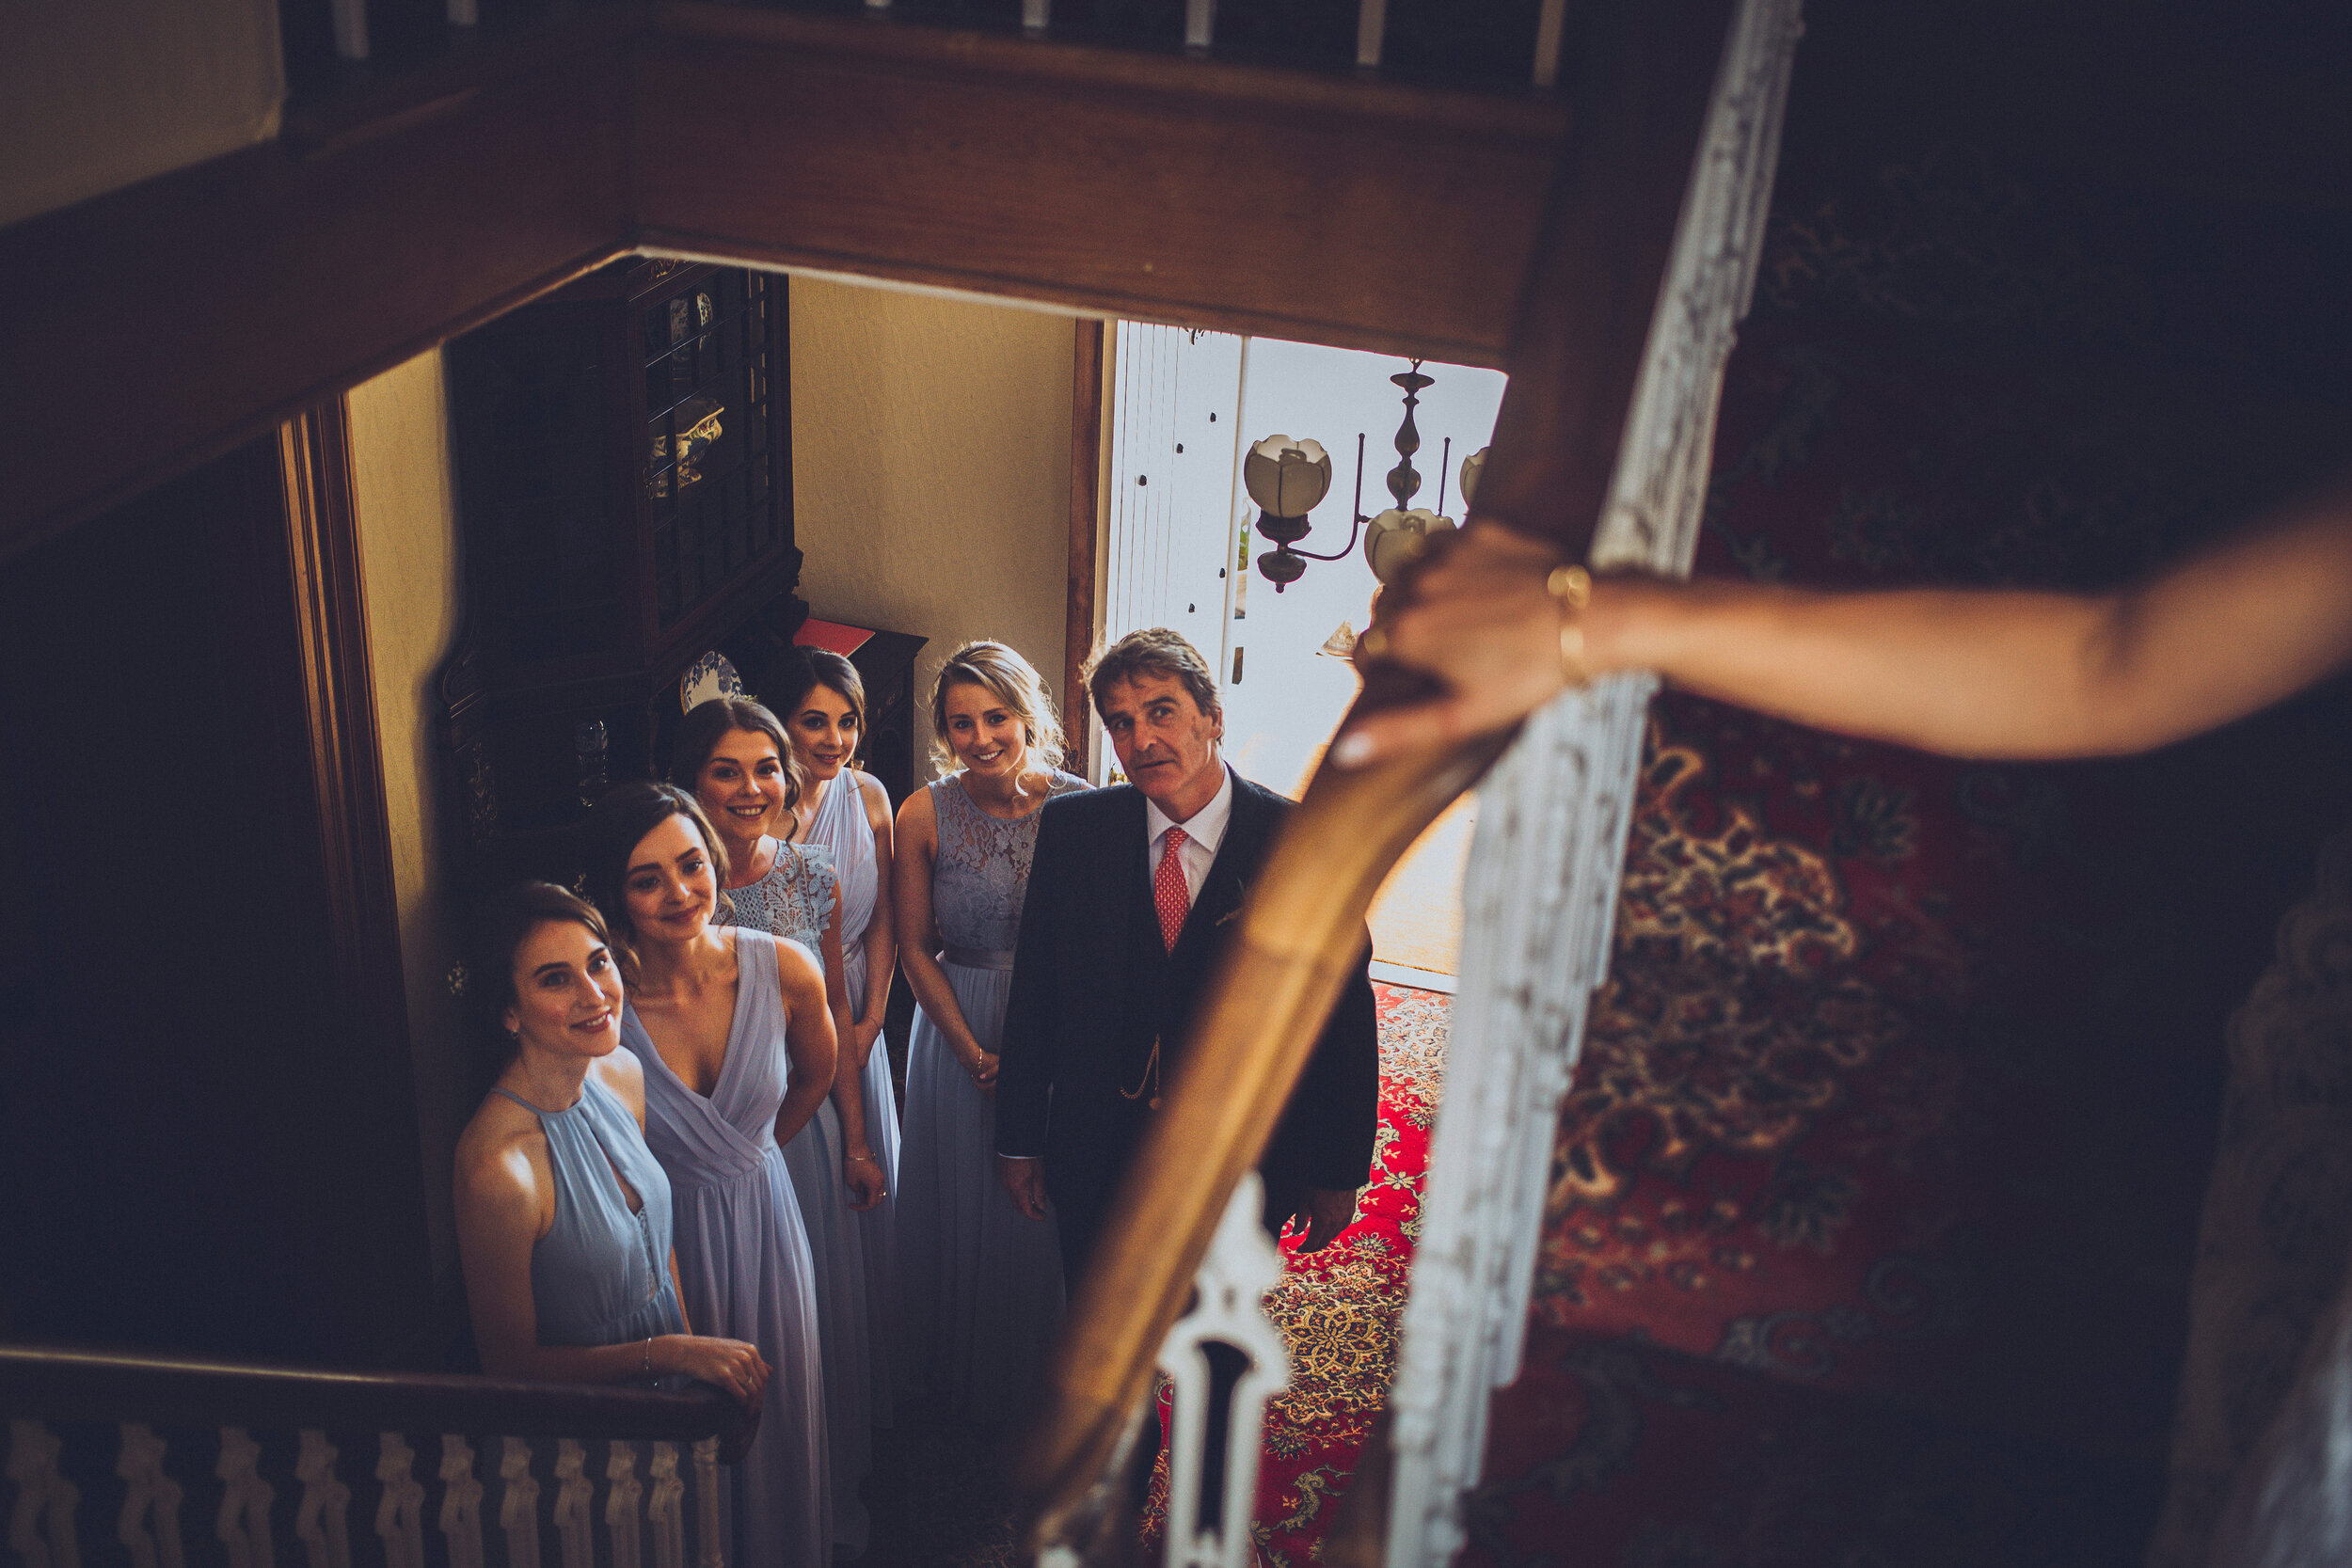 Dalduff Farm Ayrshire Wedding Photography - Claire Basiuk Photographer - 04.jpg